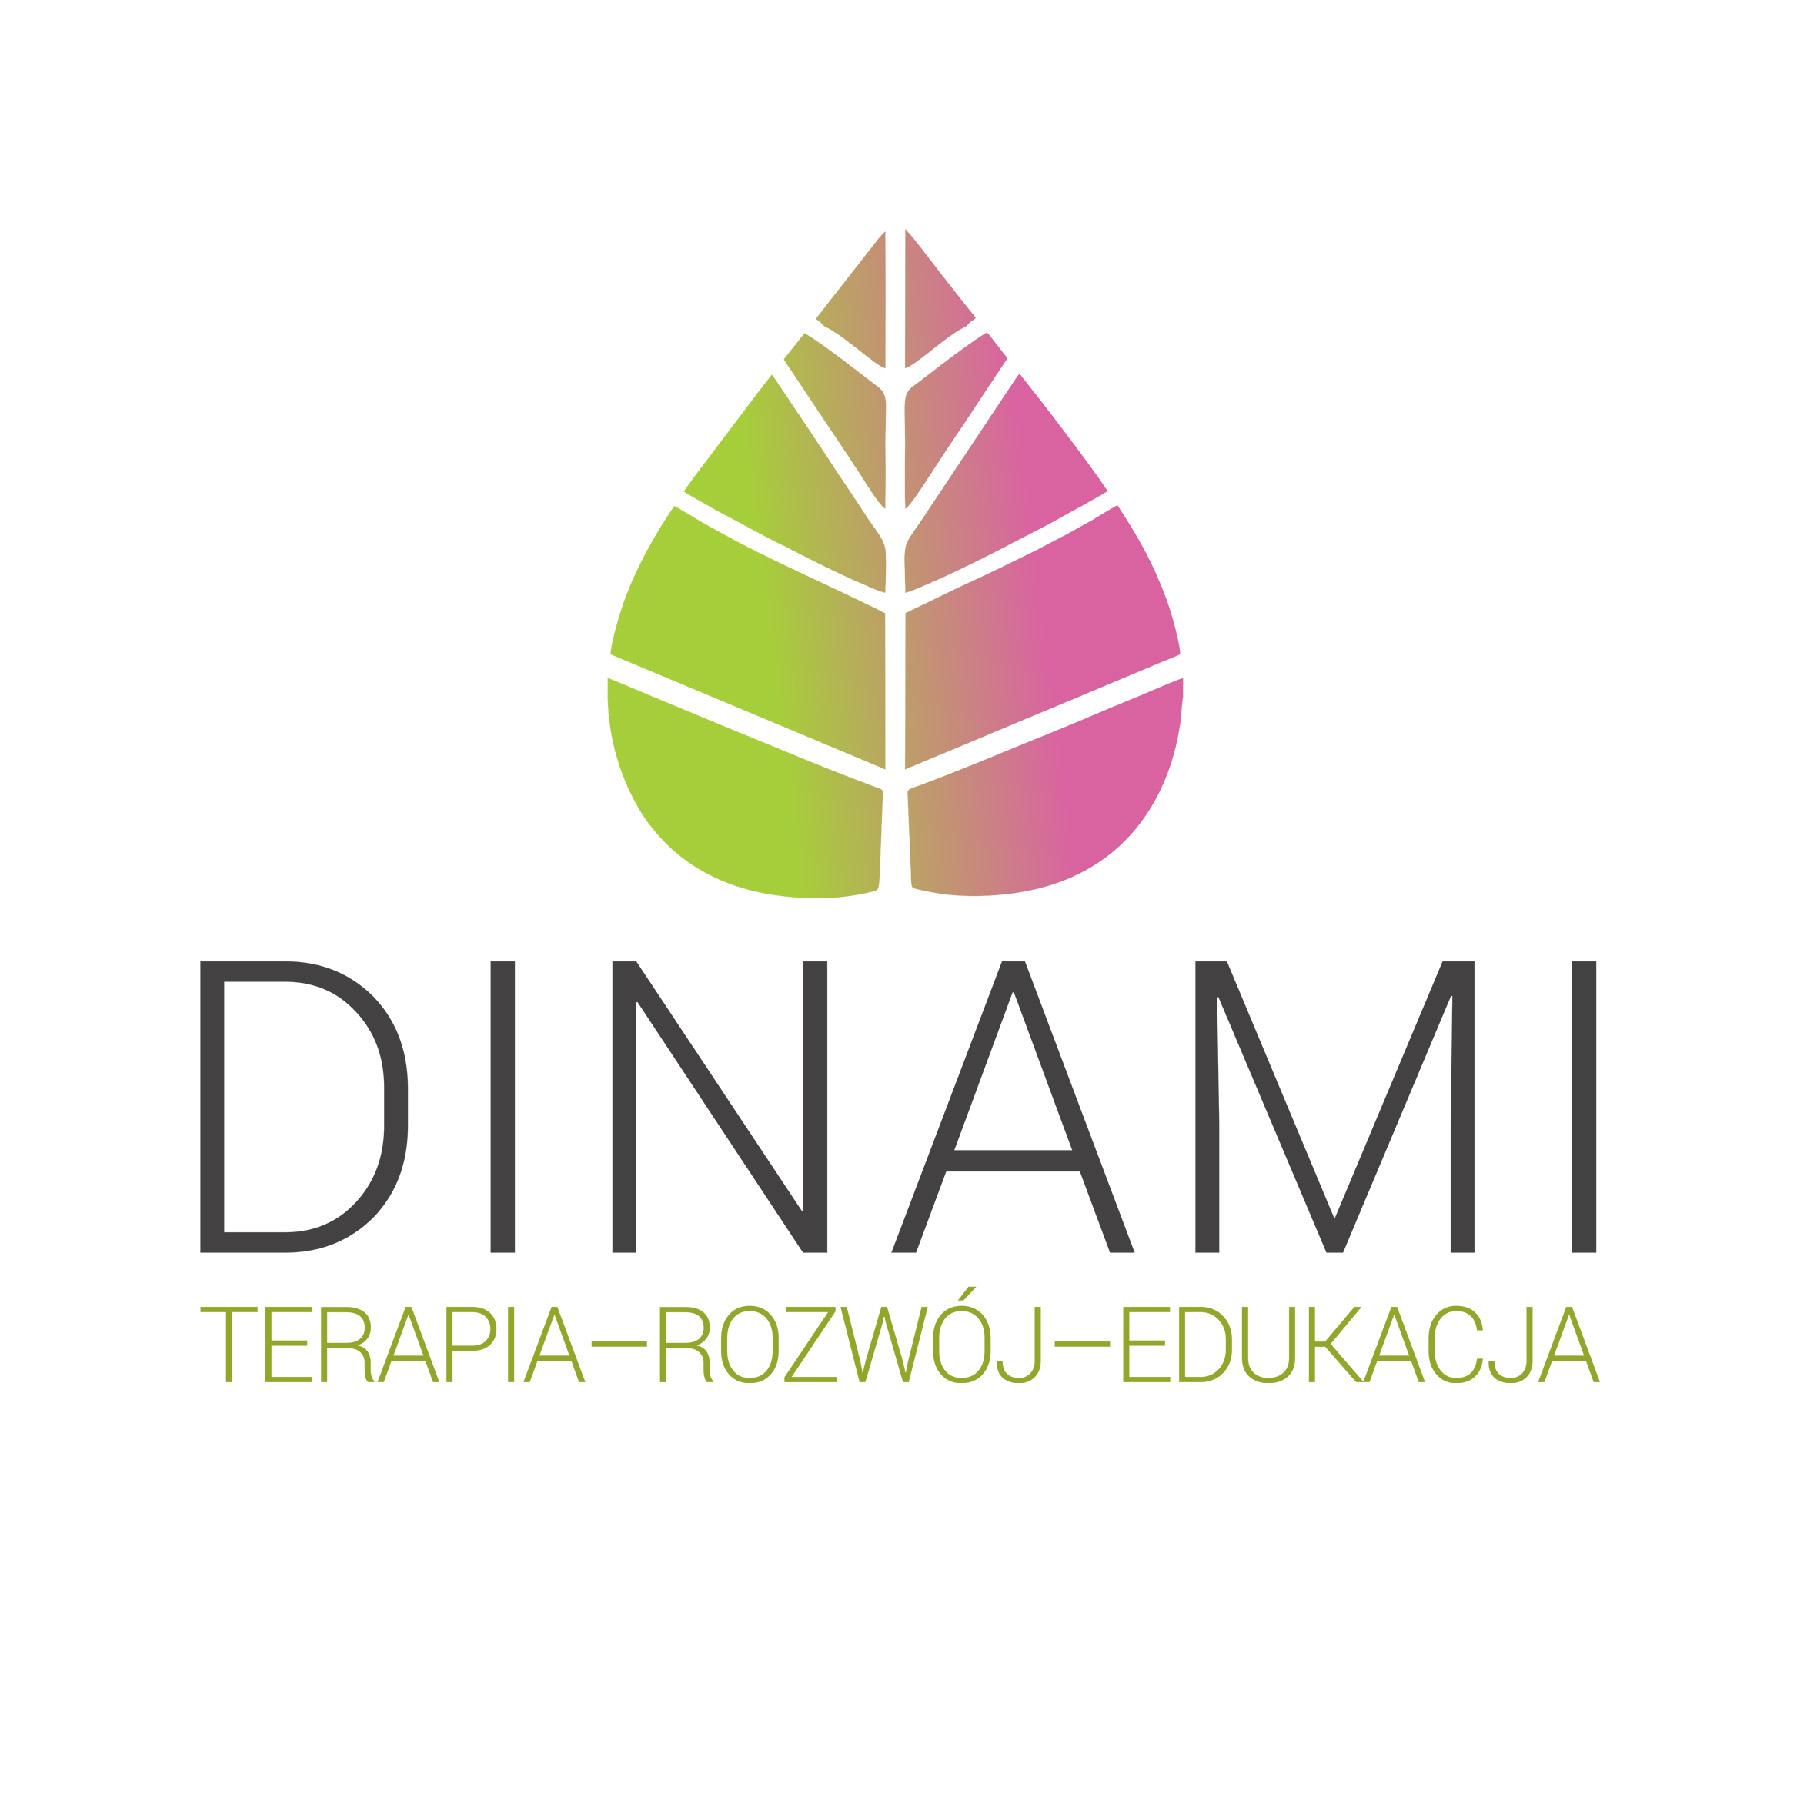 Dinami.pl